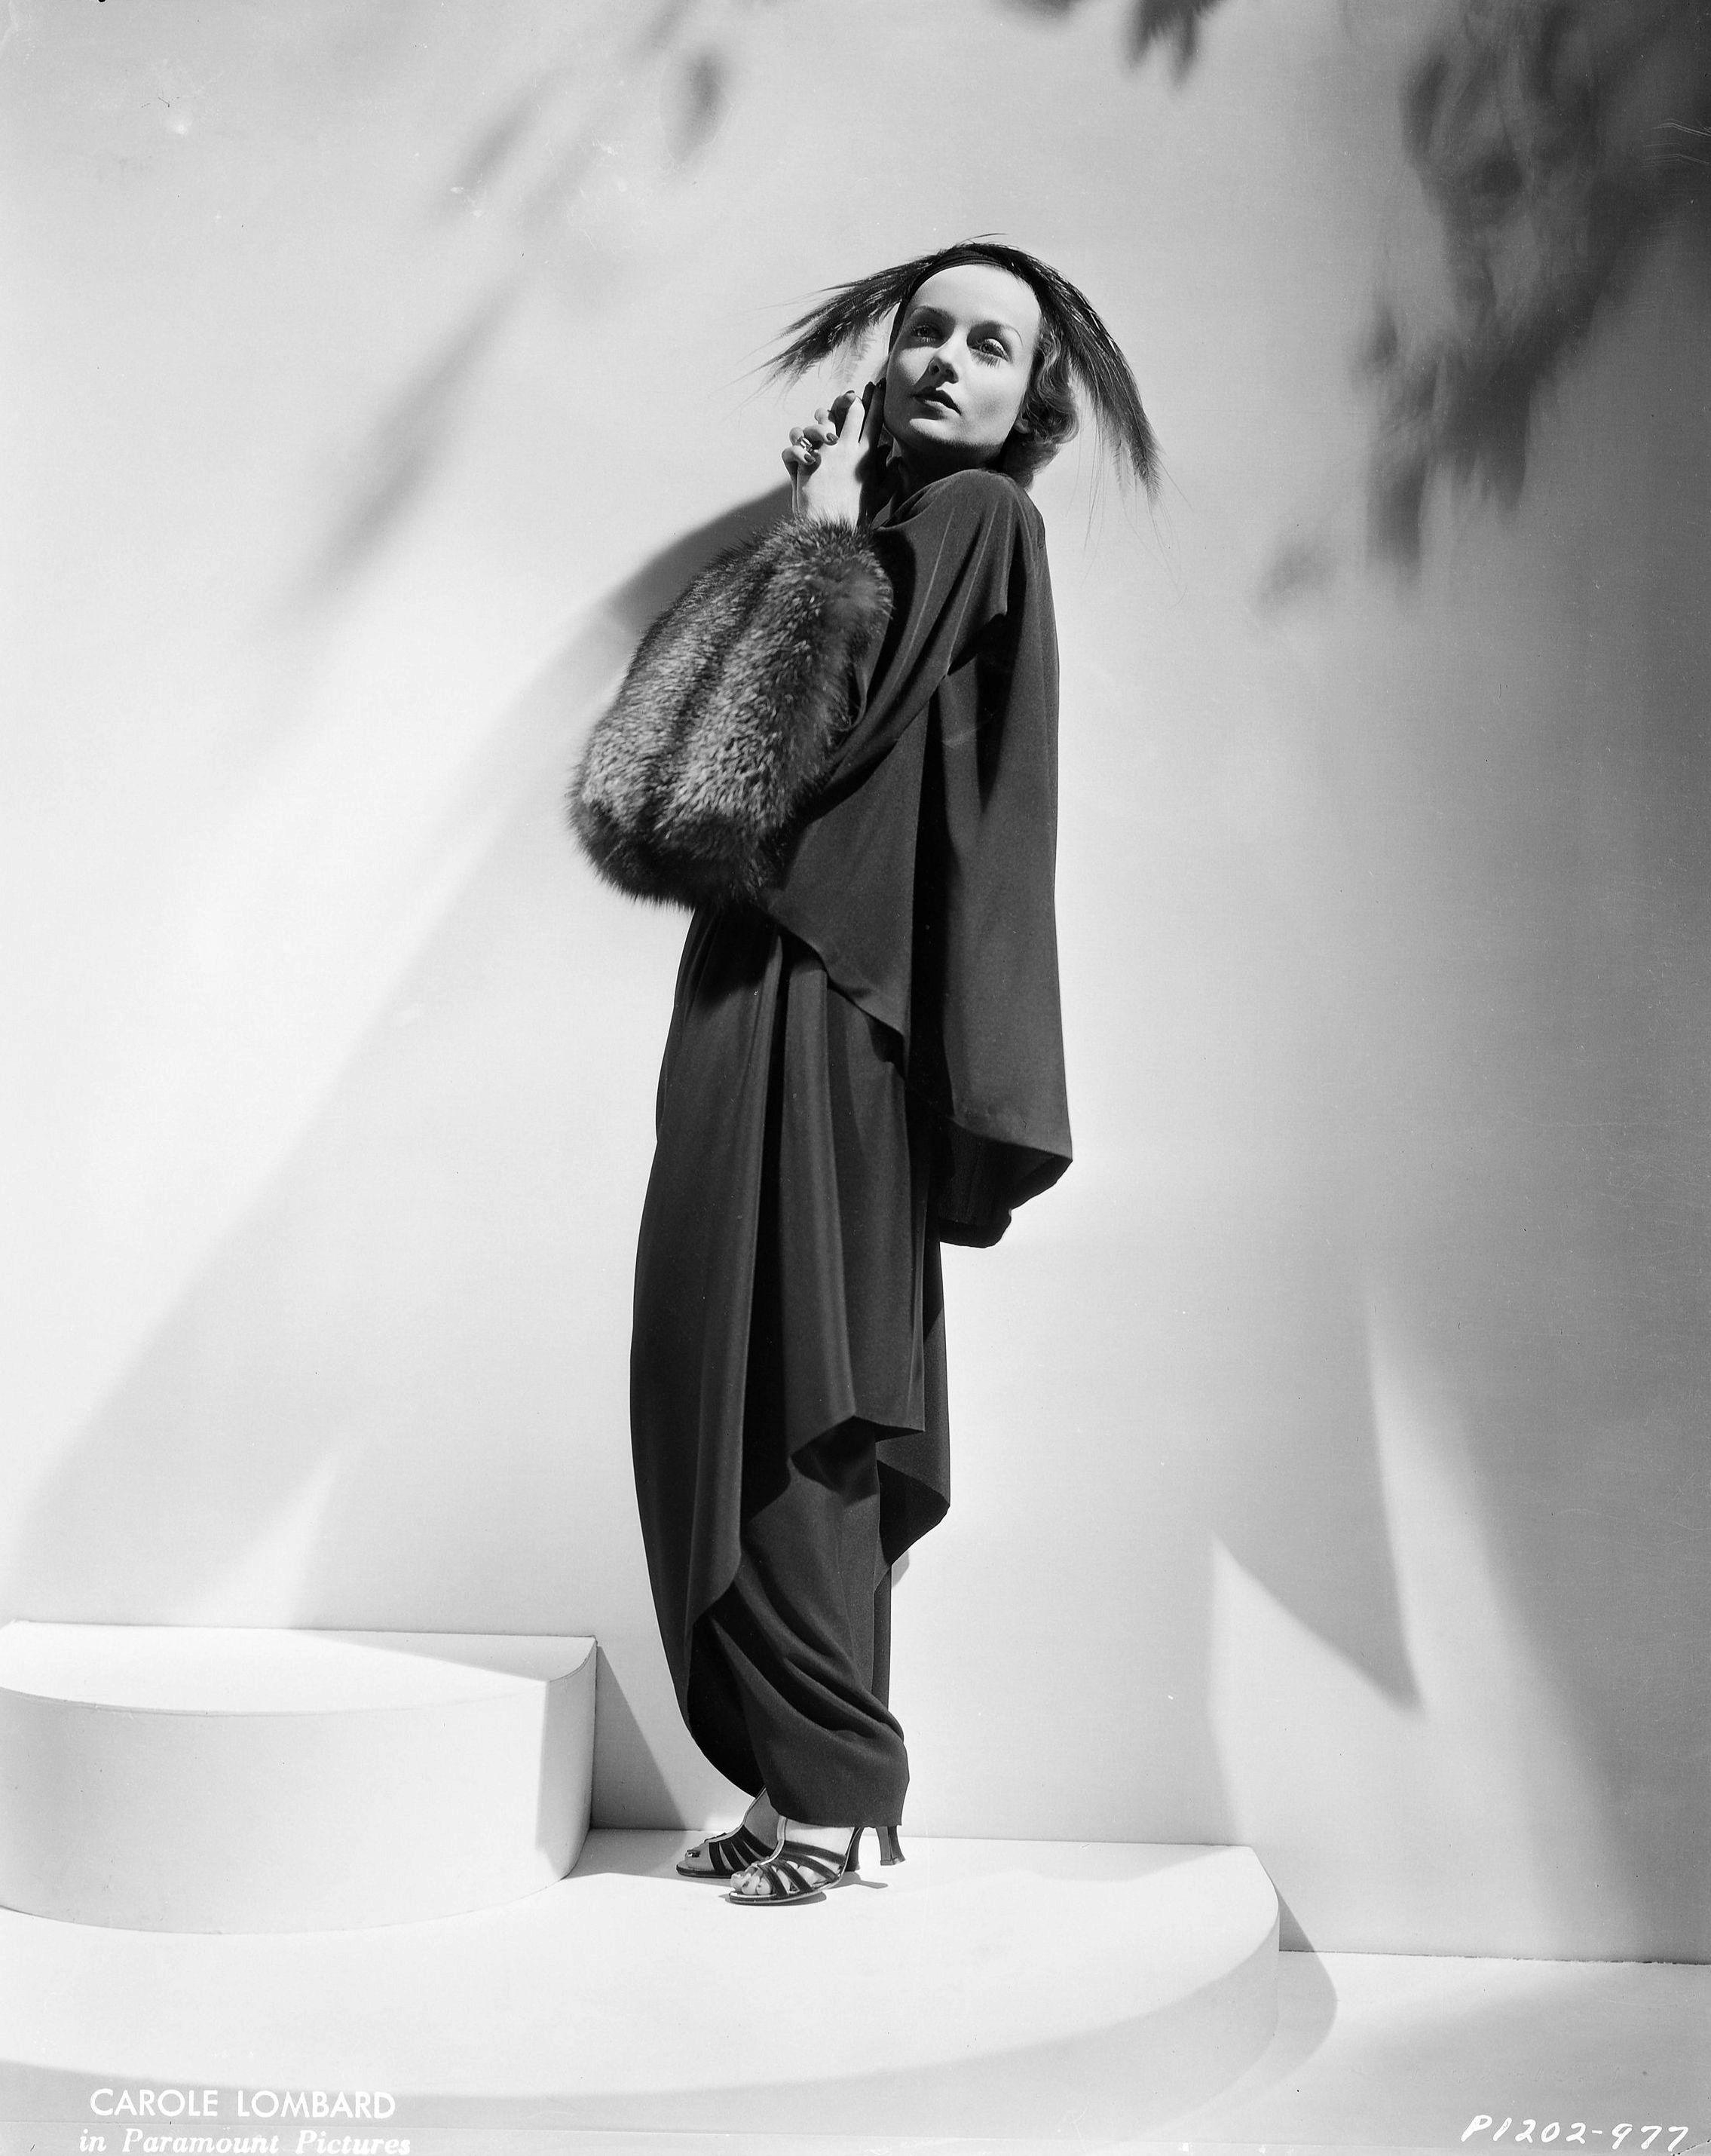 Carole Lombard (Paramount, 1935); photo by Eugene Robert Richee